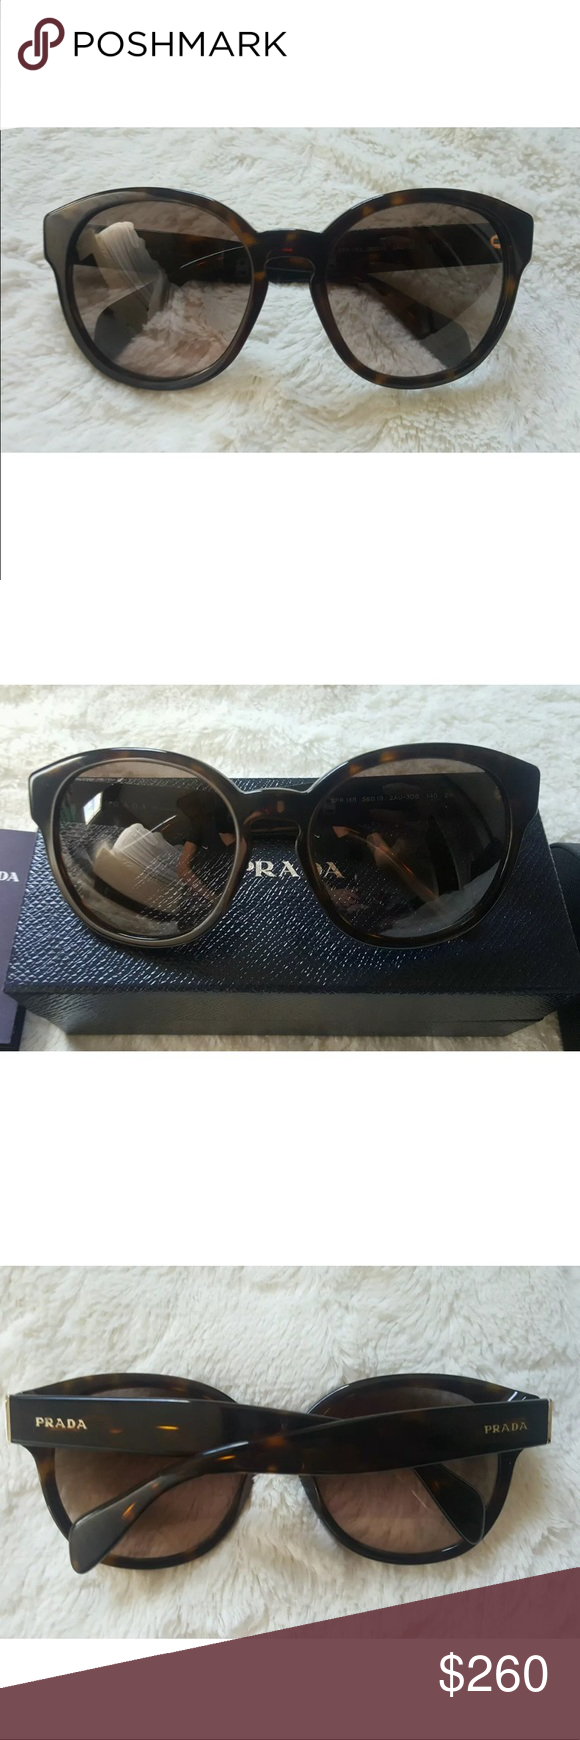 7000b44049e9 ... cheapest prada sunglasses authentic prada tortoise brown sunglasses spr  18r. only worn a handful of ...